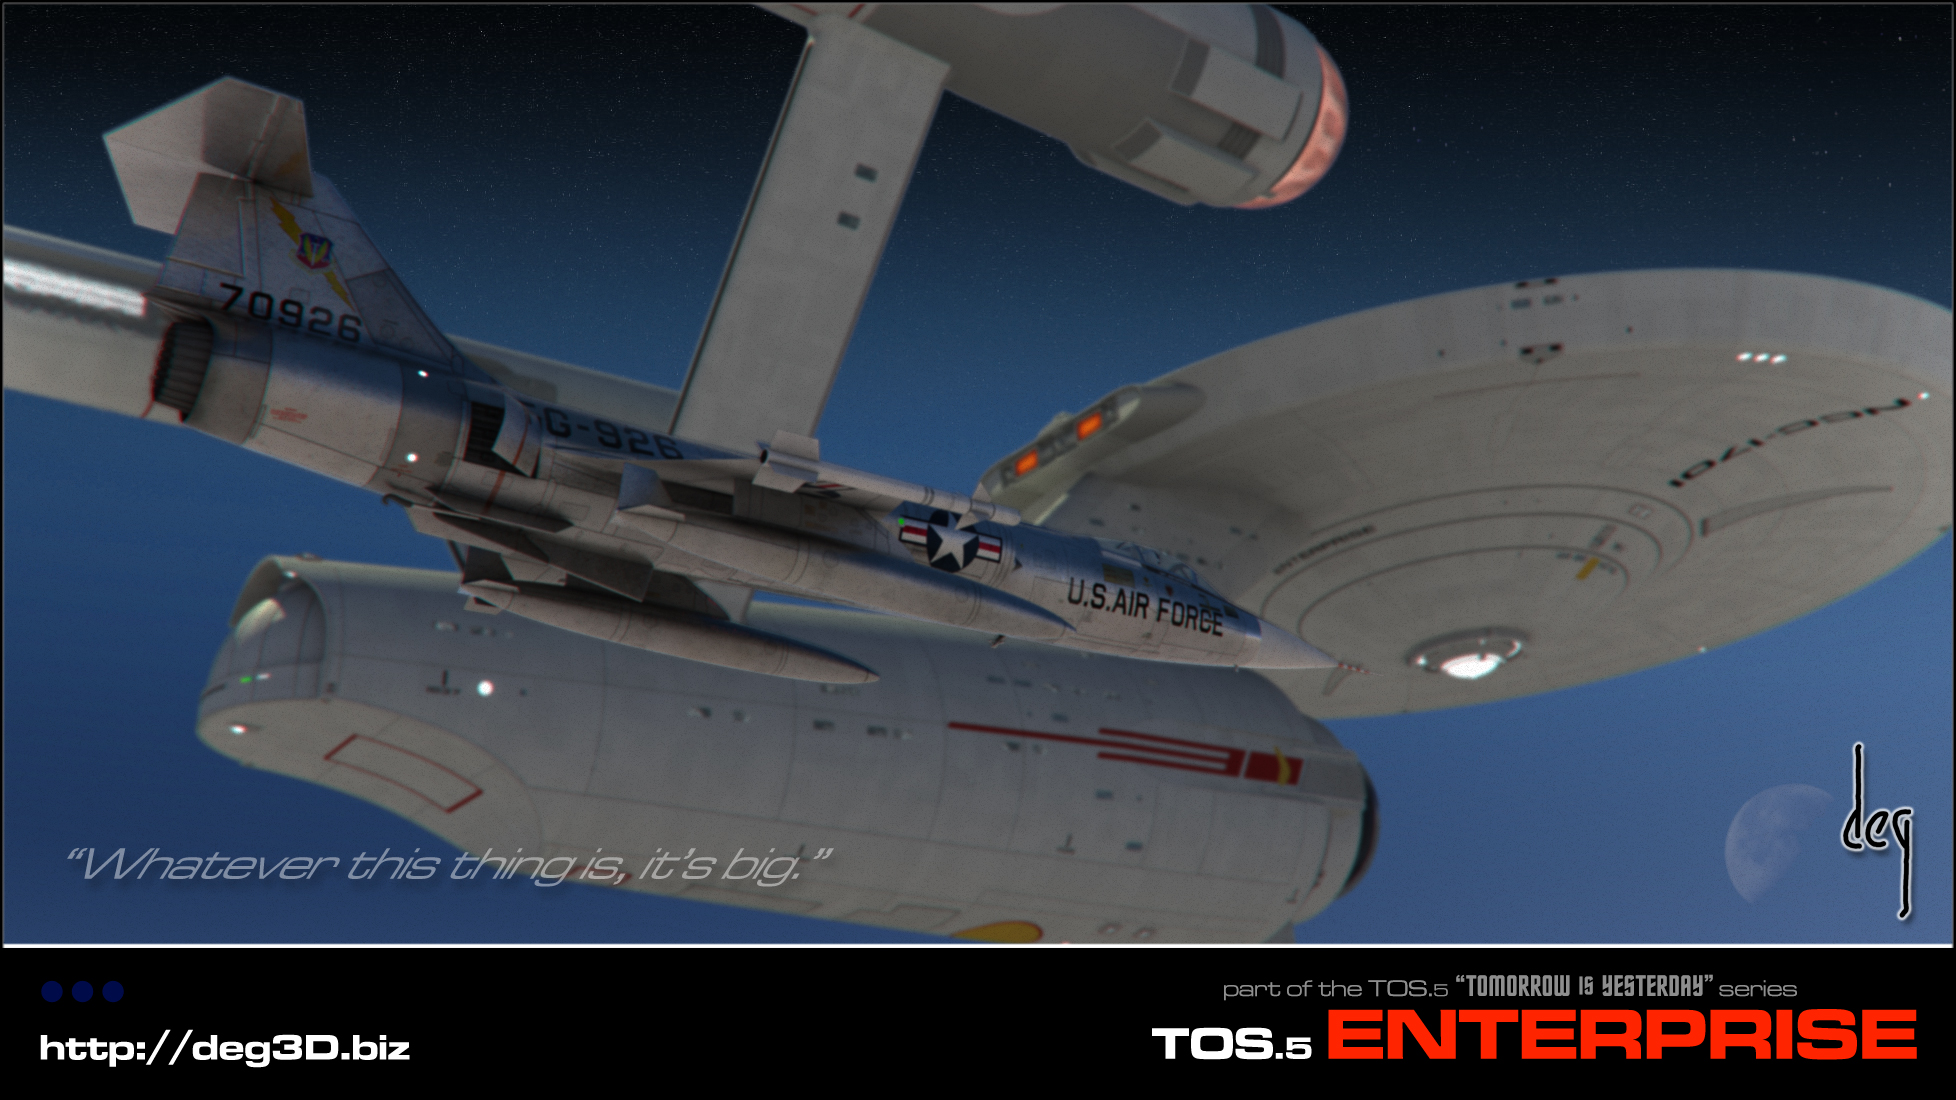 Star Trek Tech Questions Archive Straight Dope Message Board Http Zedomaxcom Image 200610 Zedomaxheartratemonitorgif